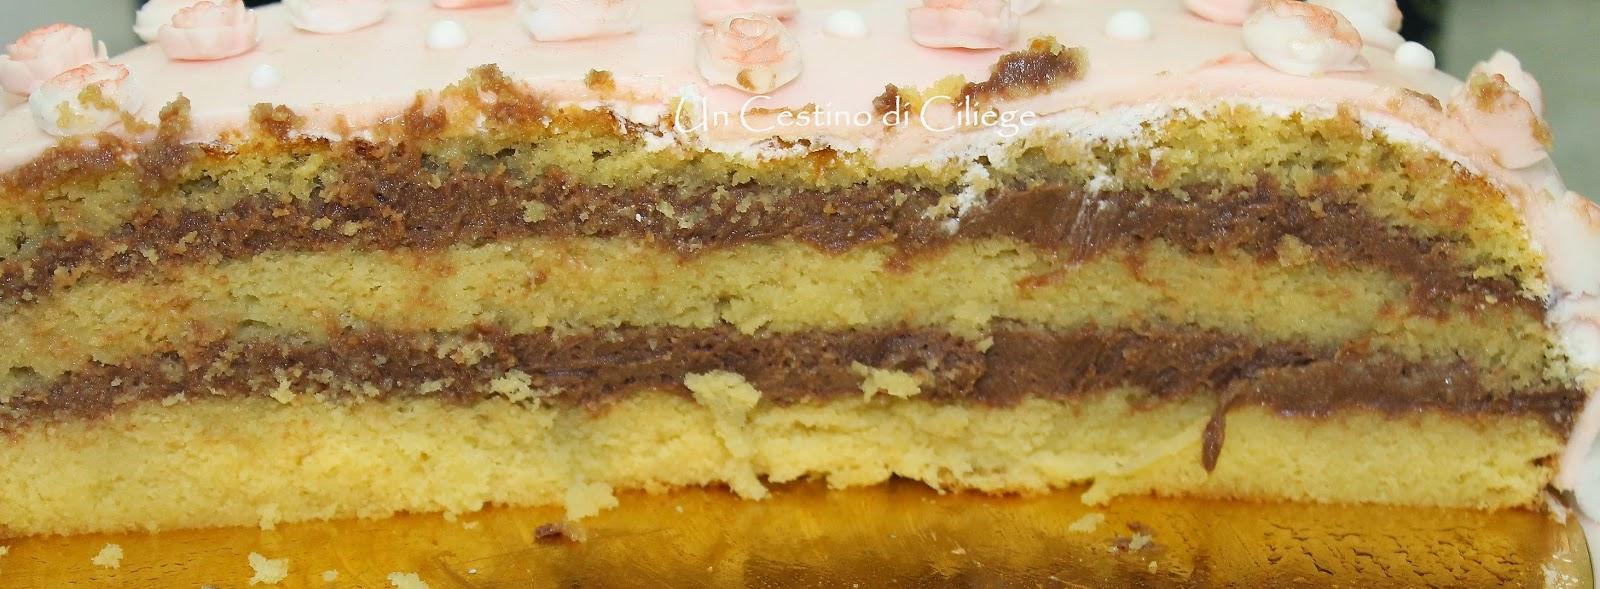 Un cestino di ciliege: Torta Roselline in PDZ!